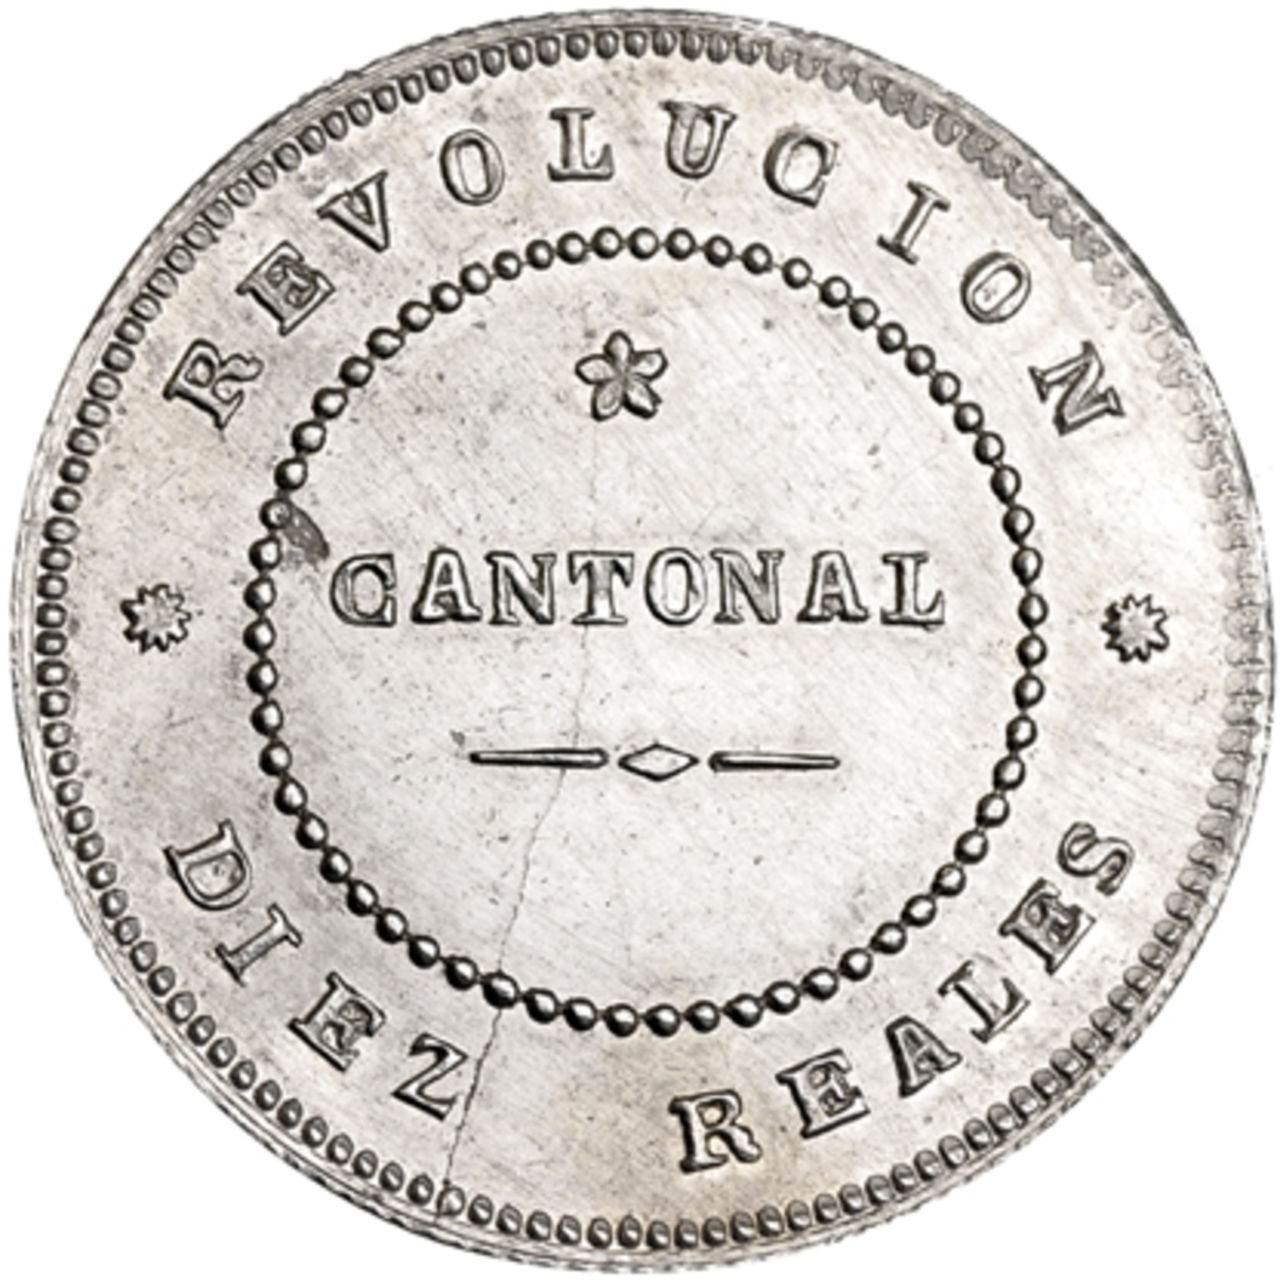 10 reales. 1873. Cartagena. Milagros Jover Navarro dedit, mi madre. 738a